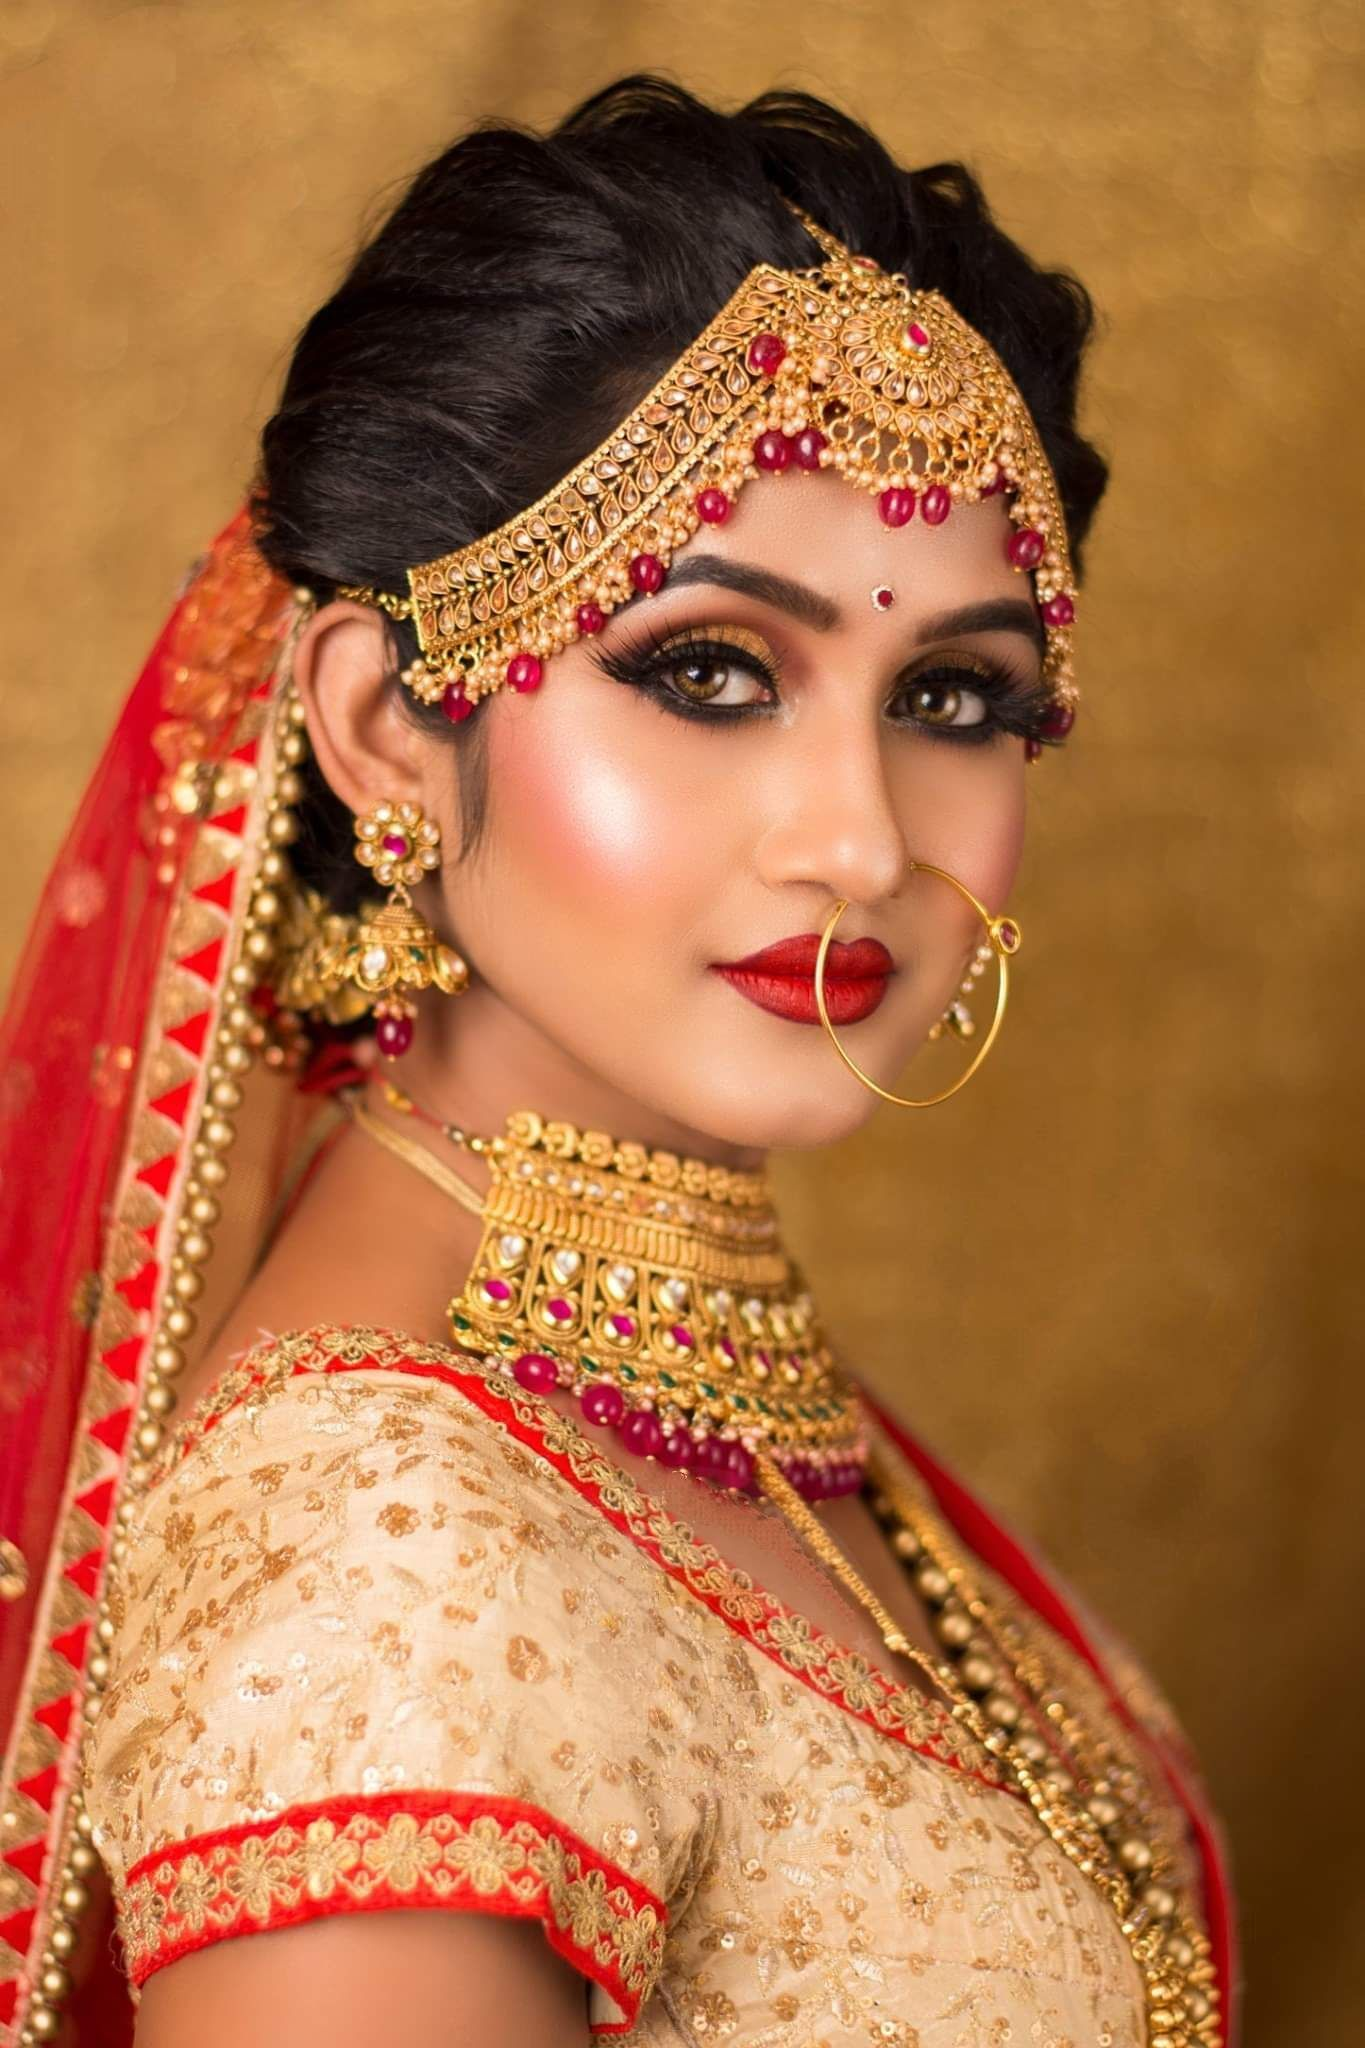 Pin by Safayet jamil Nafi on gallari Bridal makeup